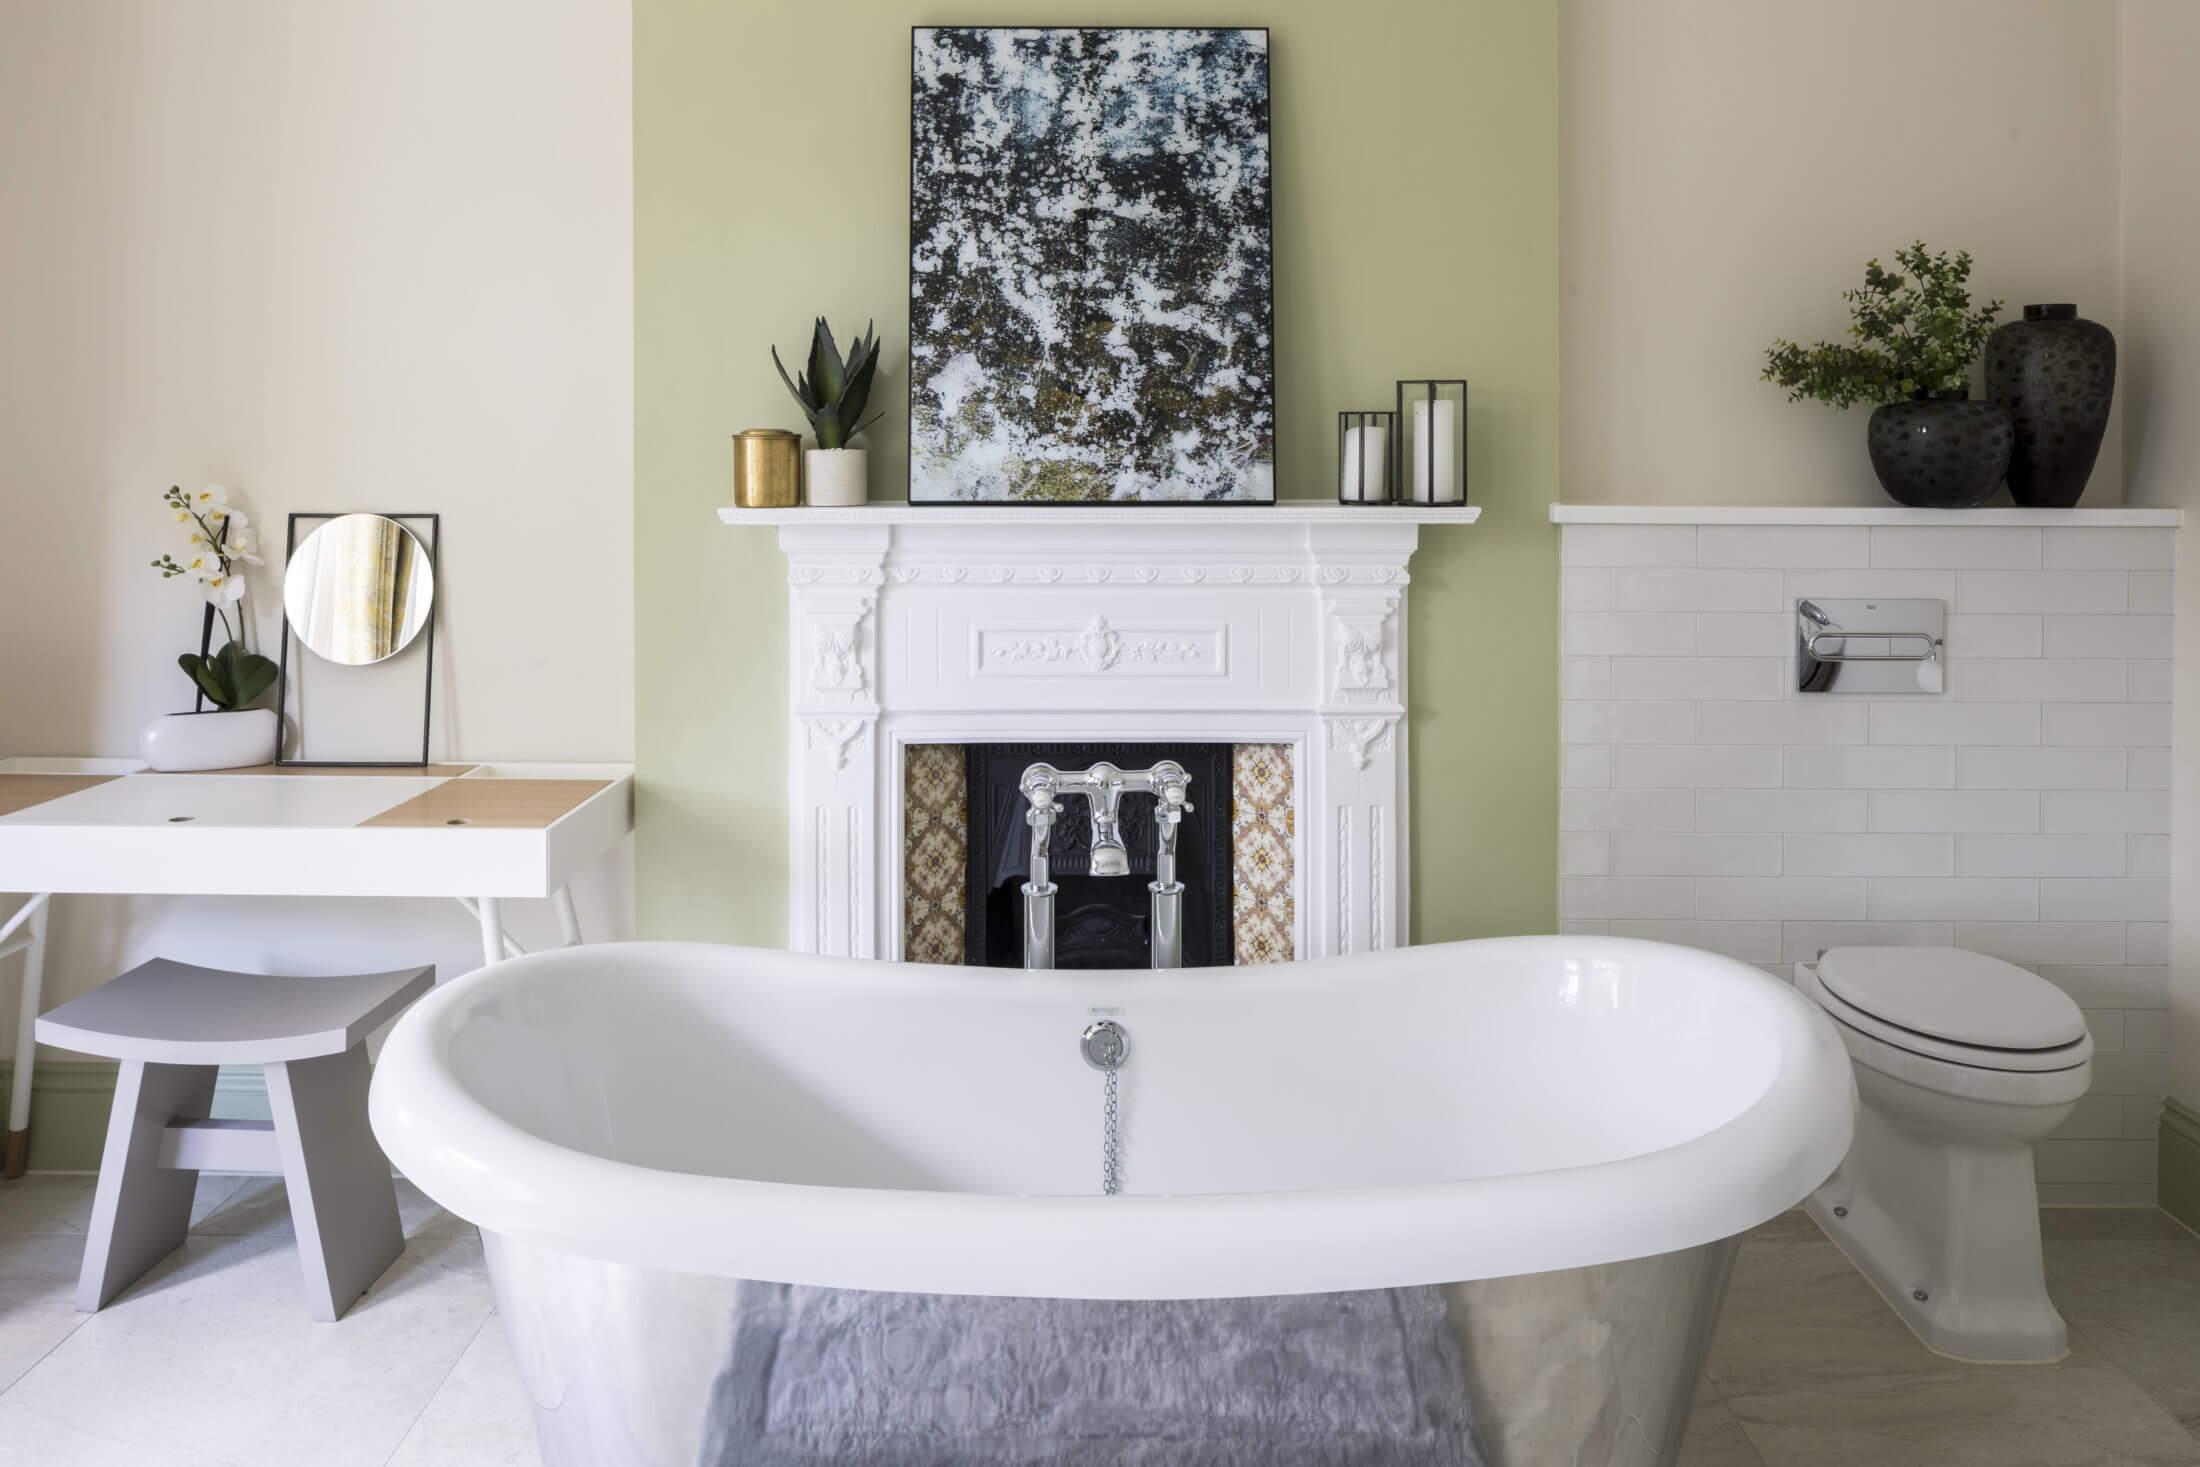 Silver bath by fireplace